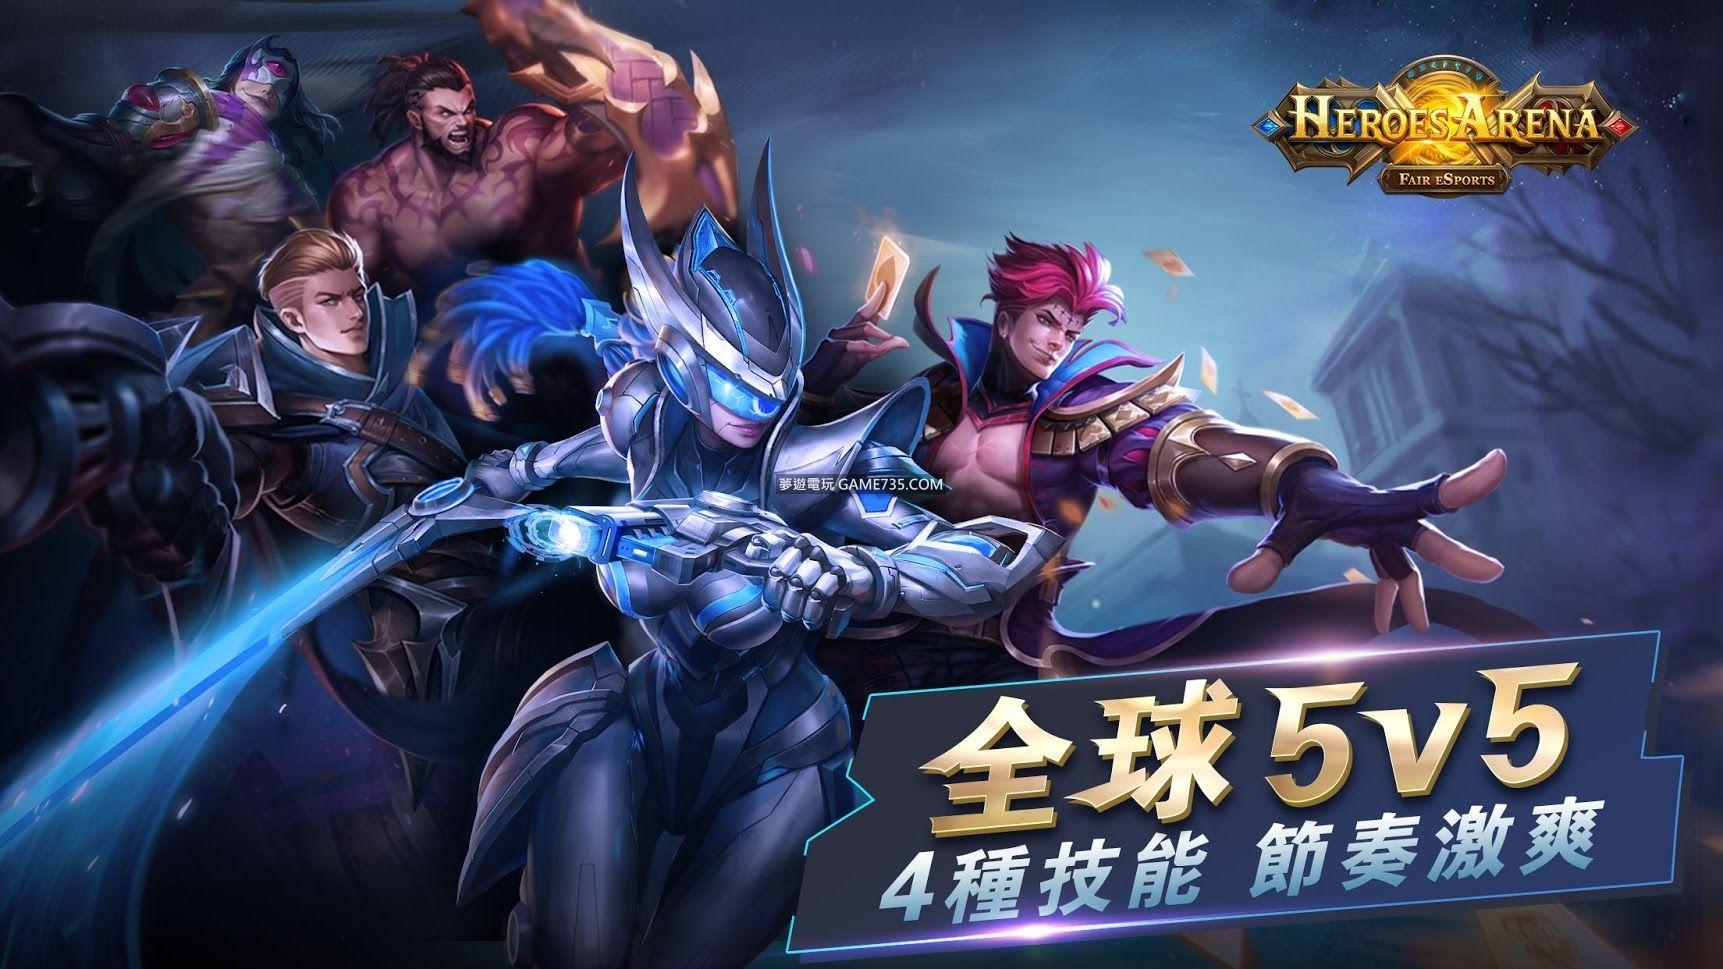 【修改版+開圖繁體】Heroes Arena v2.2.39 全地圖可見 20200605